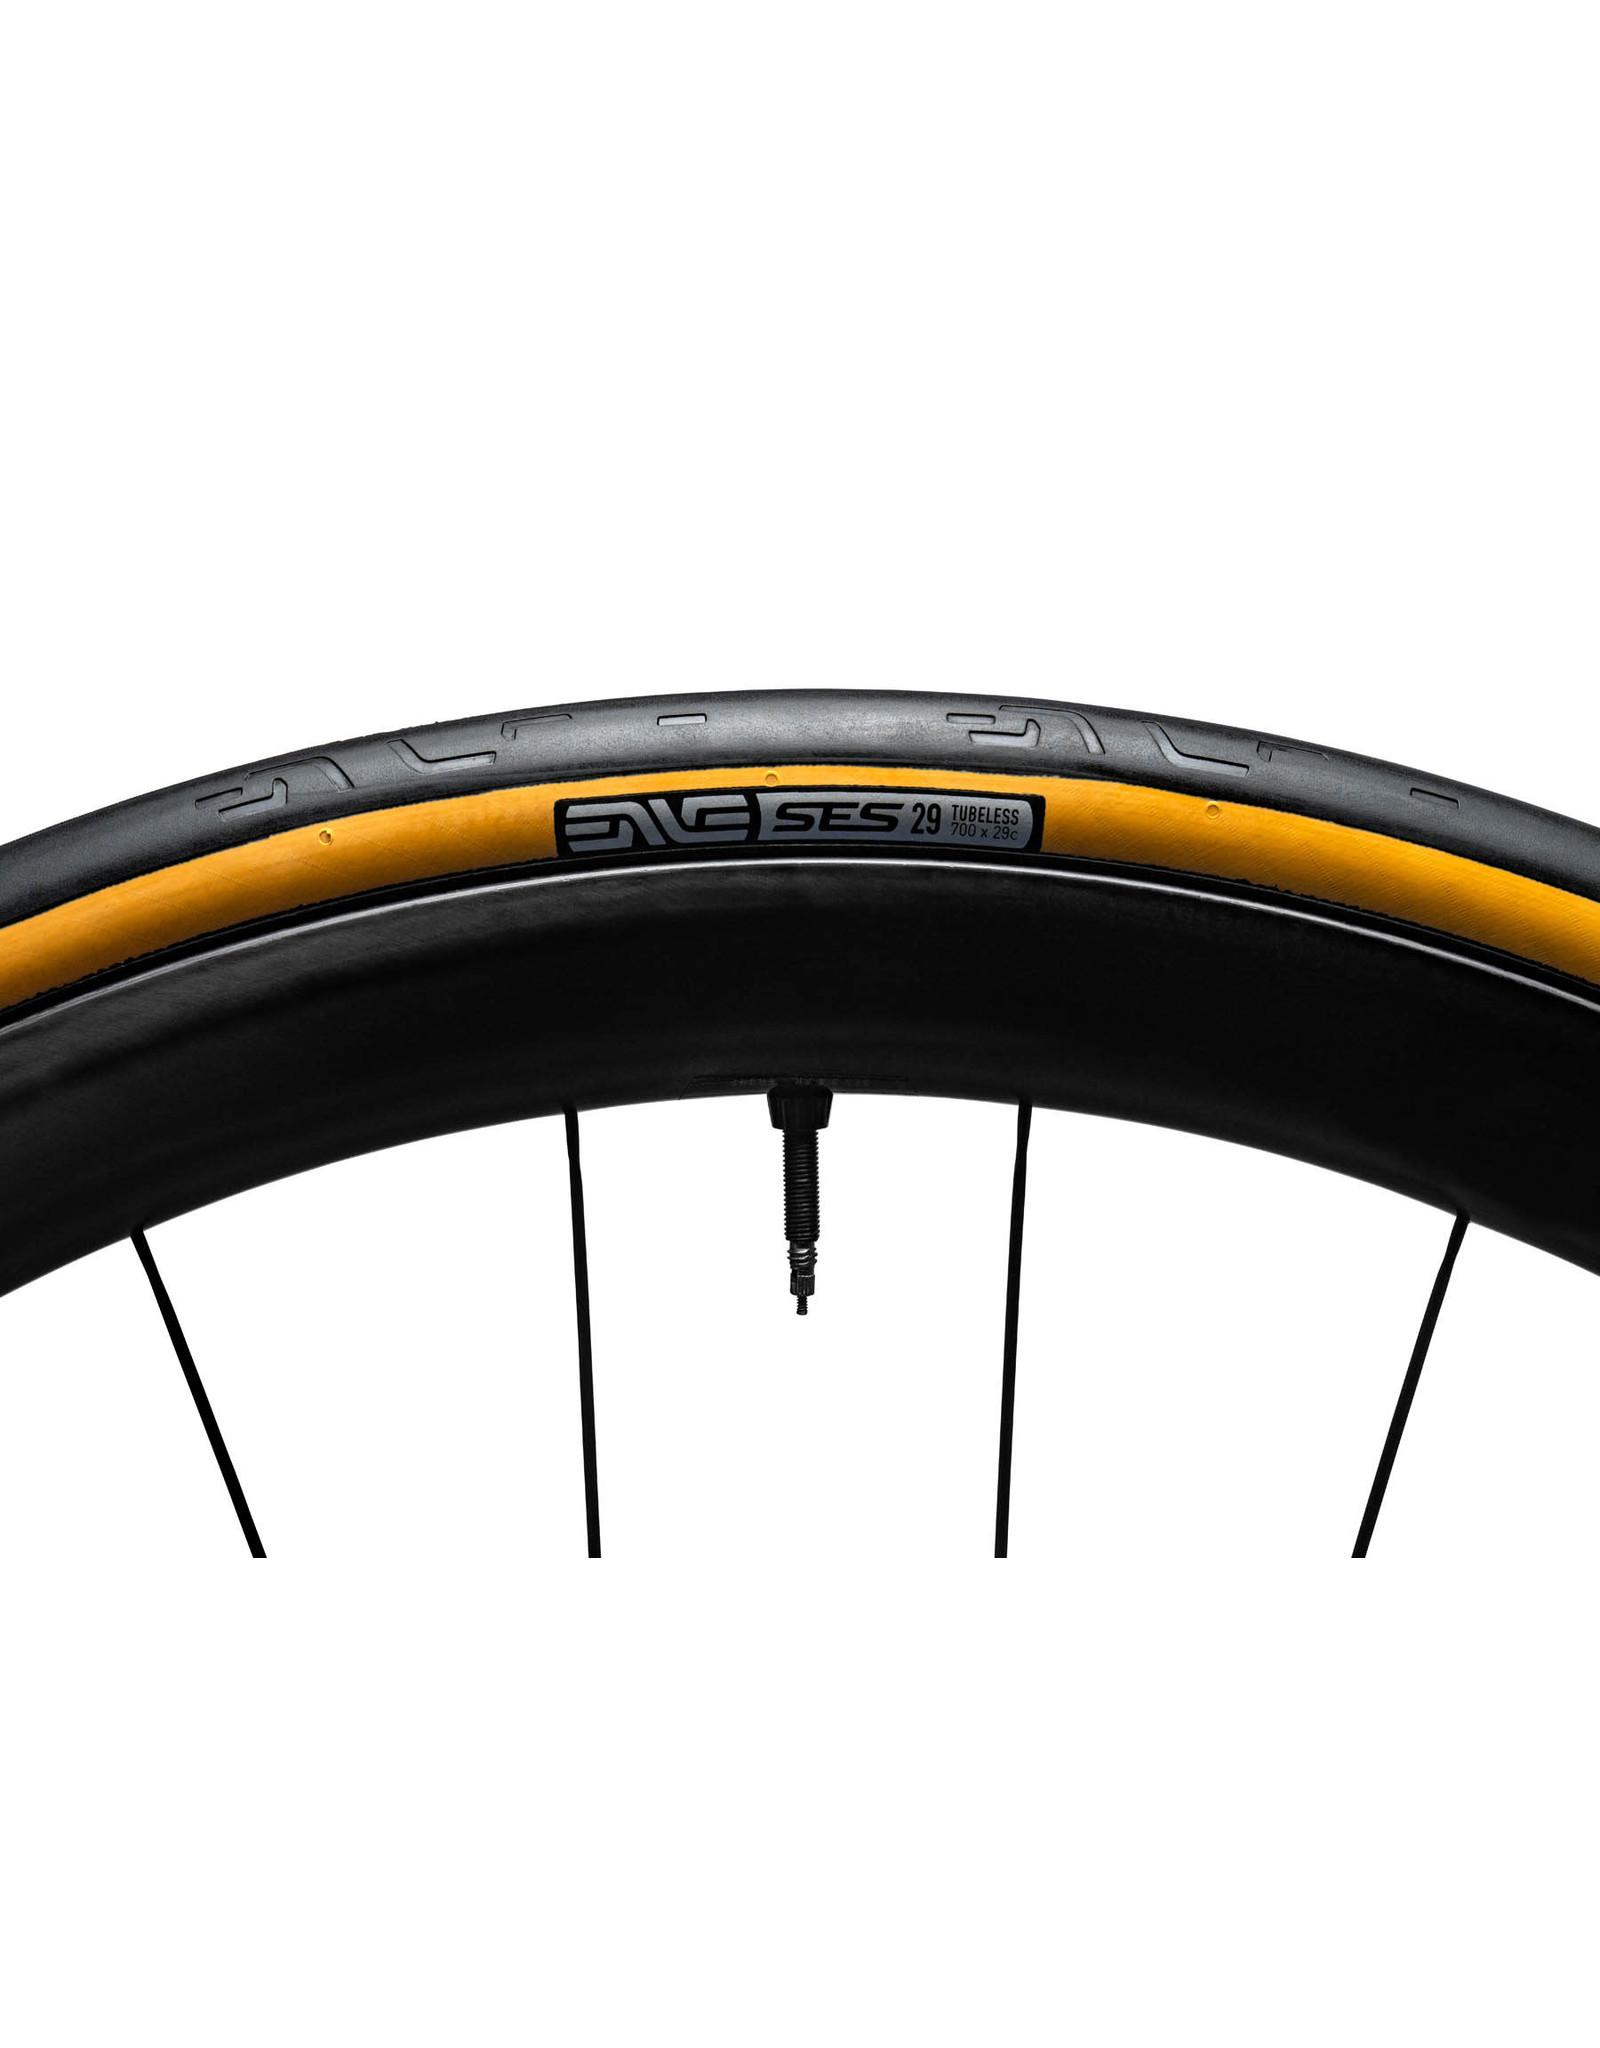 ENVE Composites ENVE SES 700x29mm Tan Wall Tire